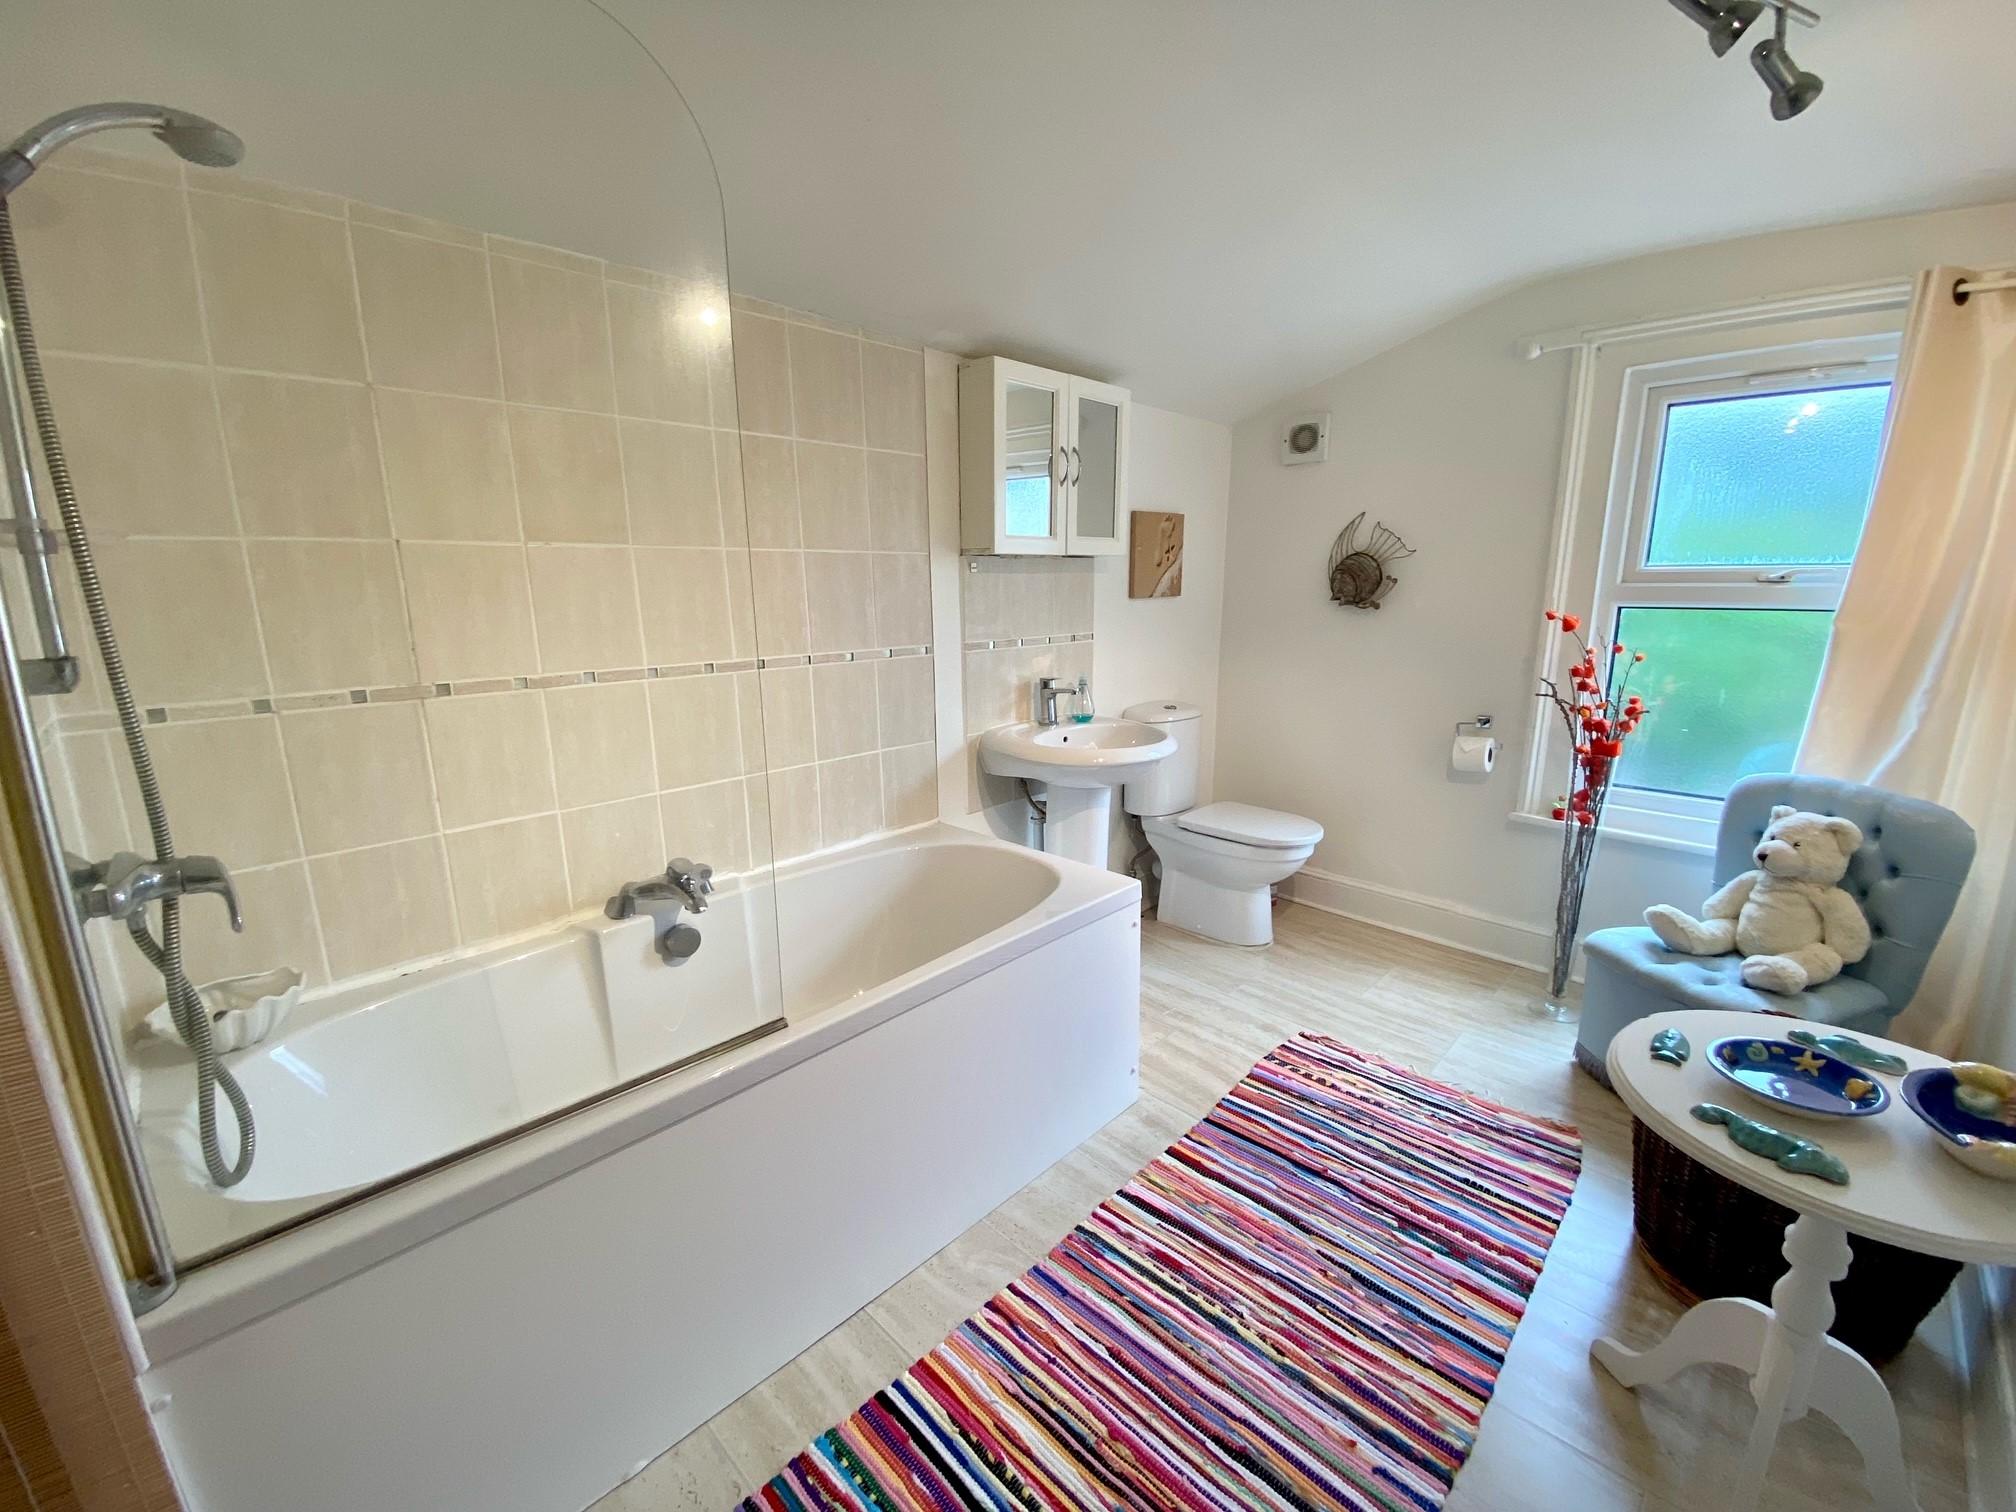 Ruthies Bathroom 1